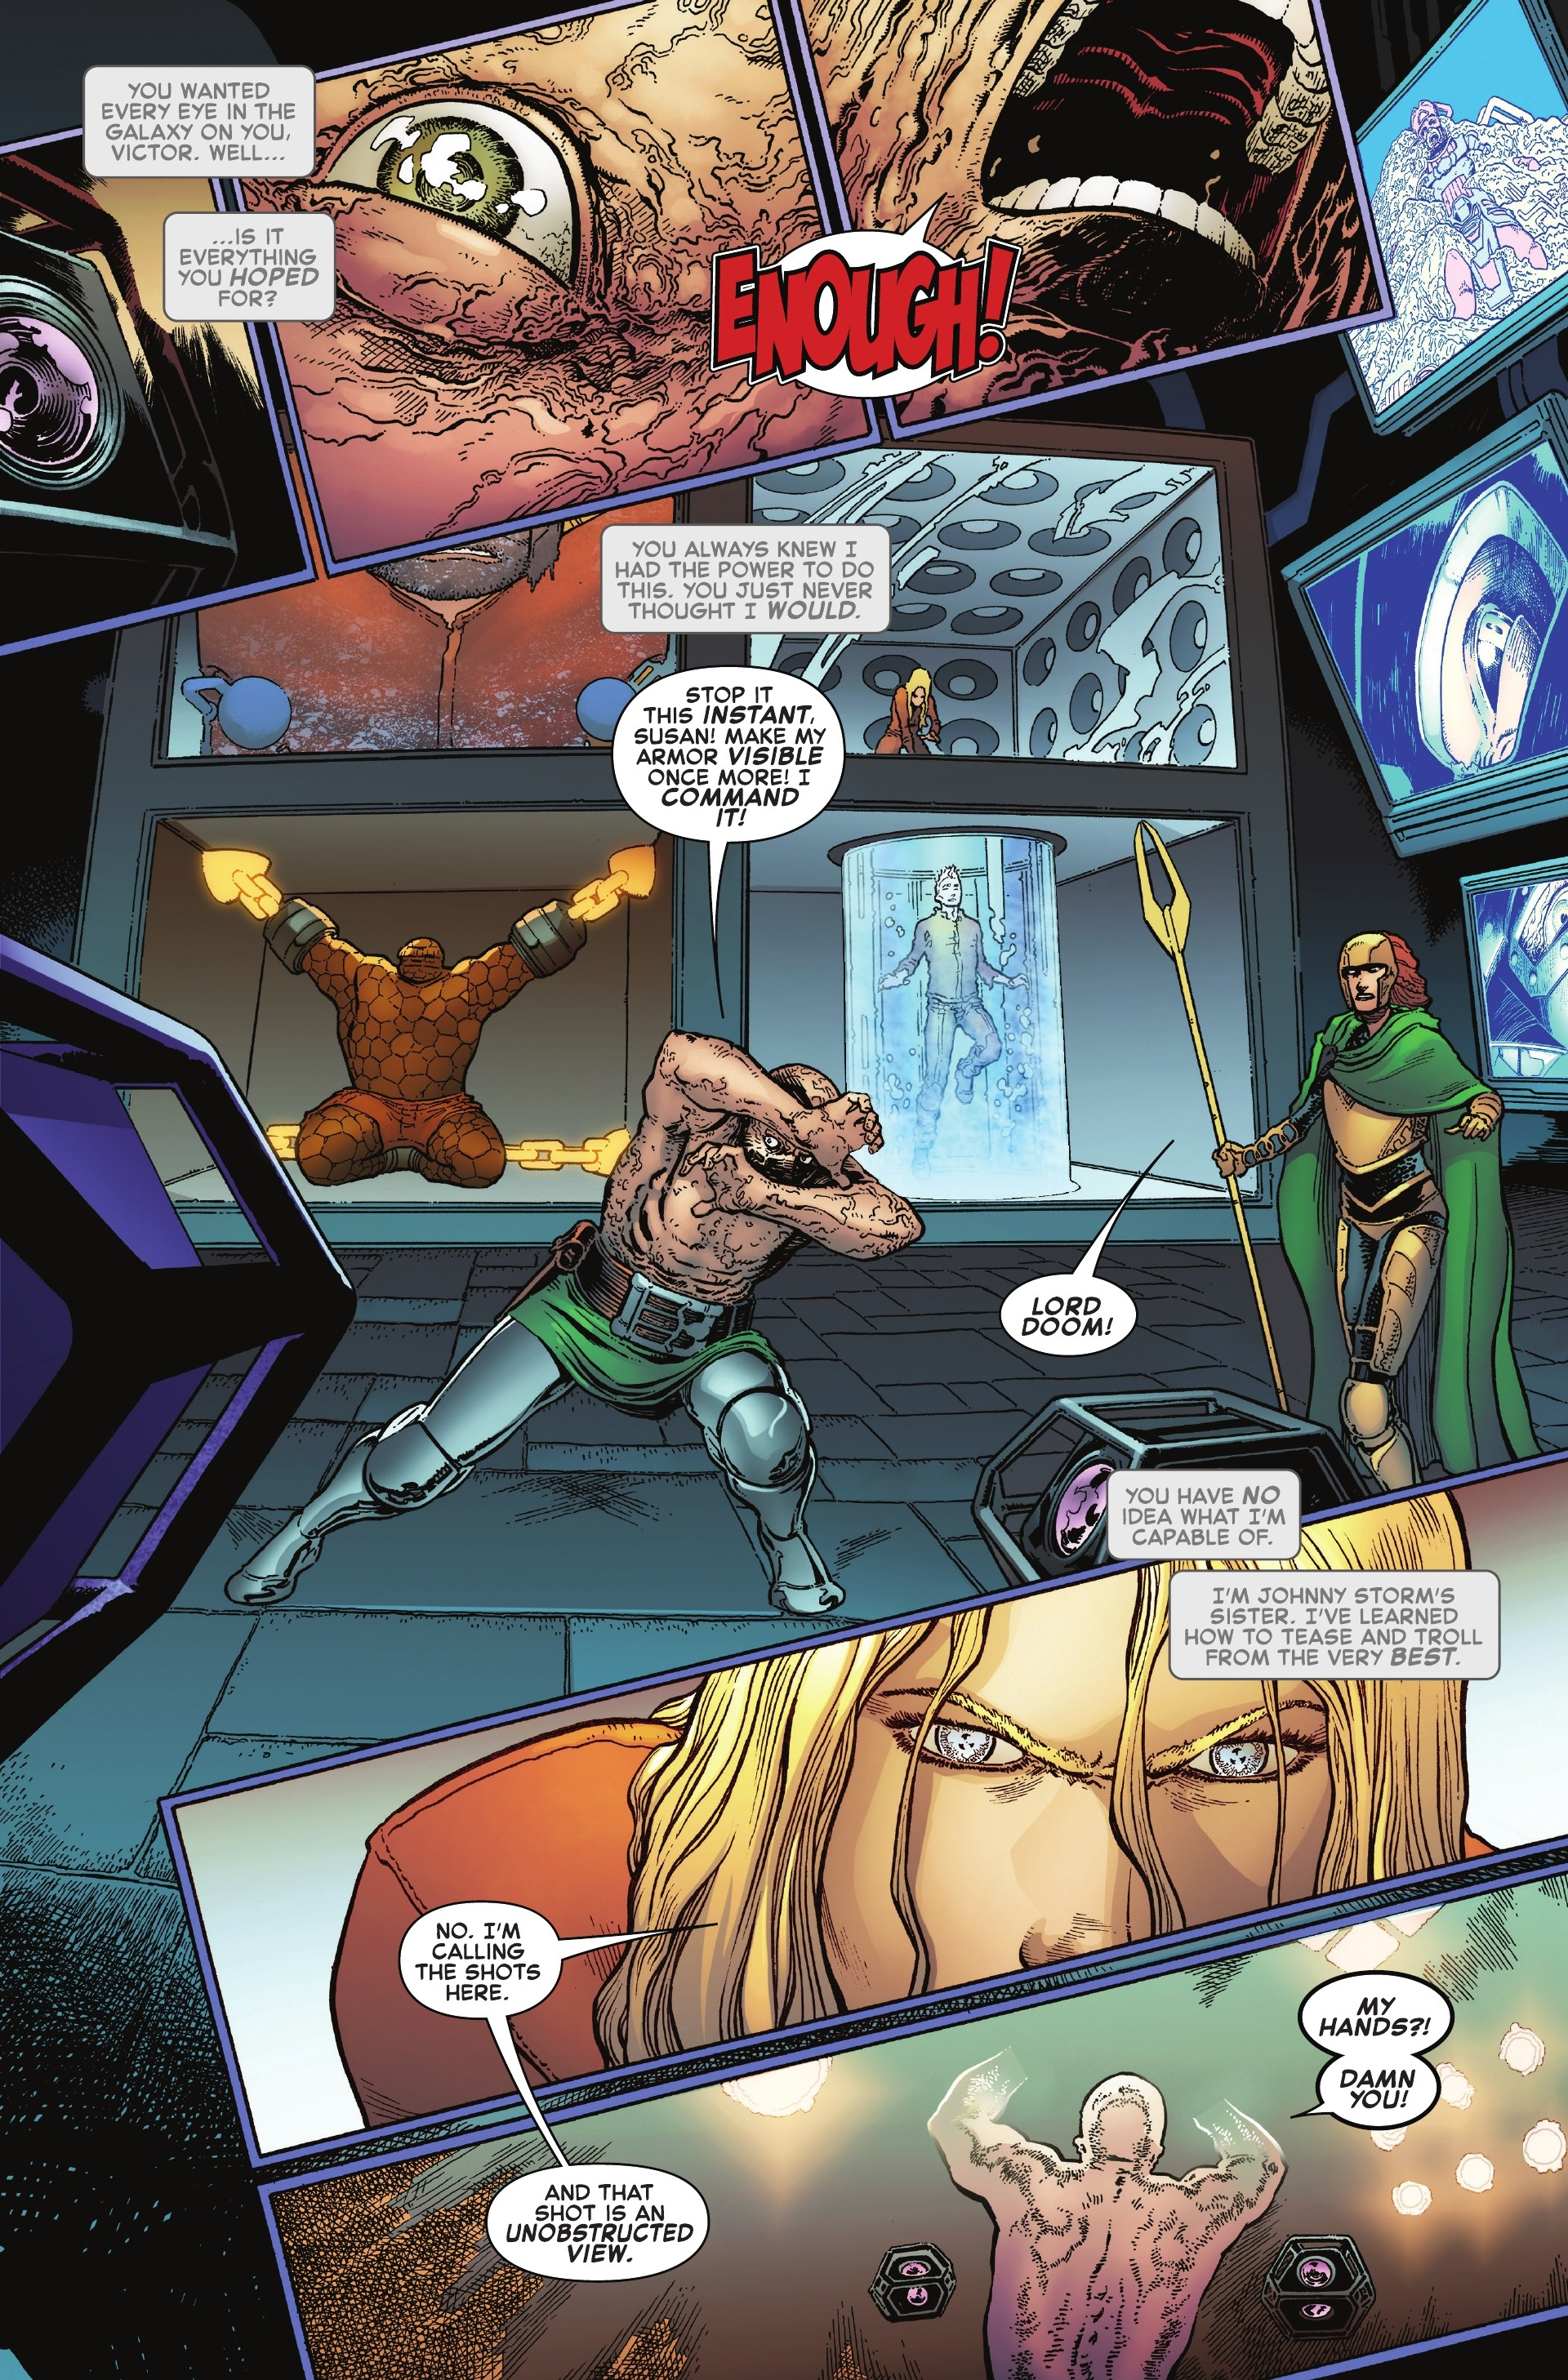 Preview: Fantastic Four #9